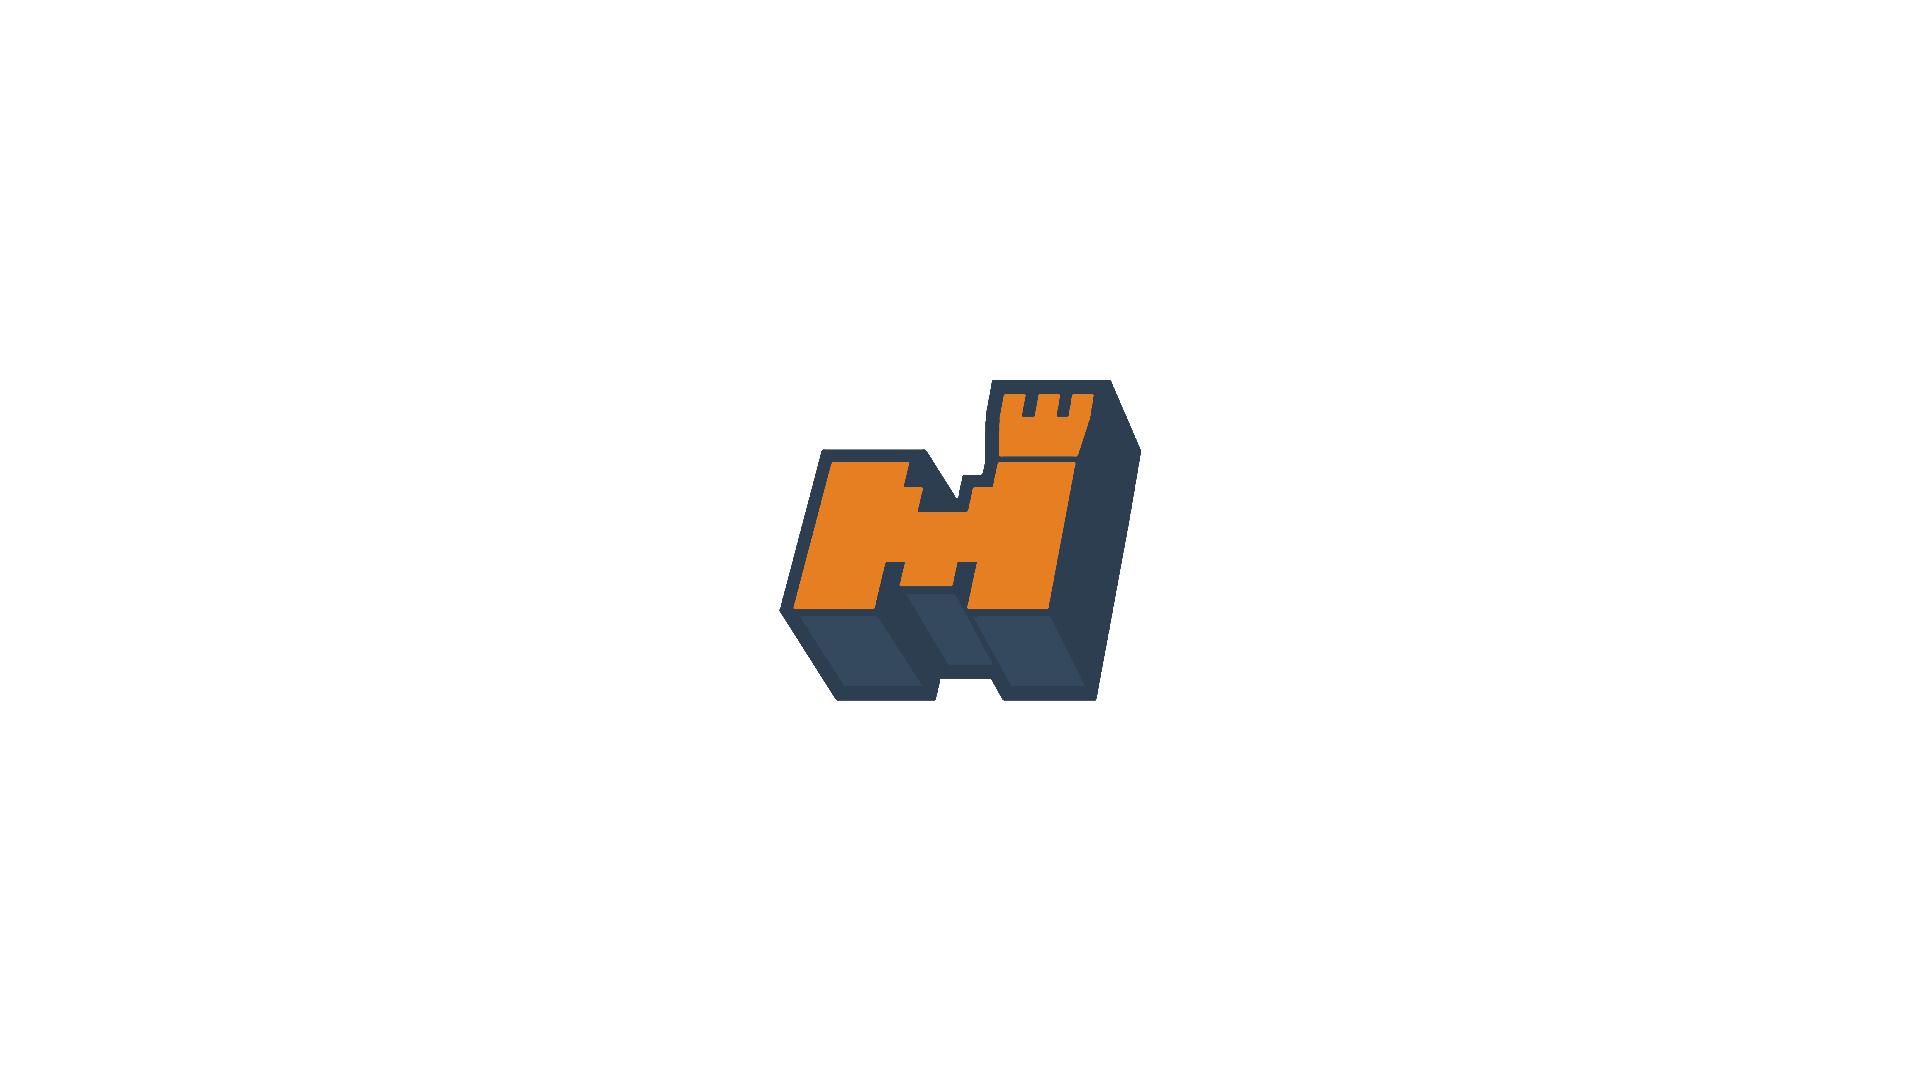 Mineplex logo png 4 » PNG Image.